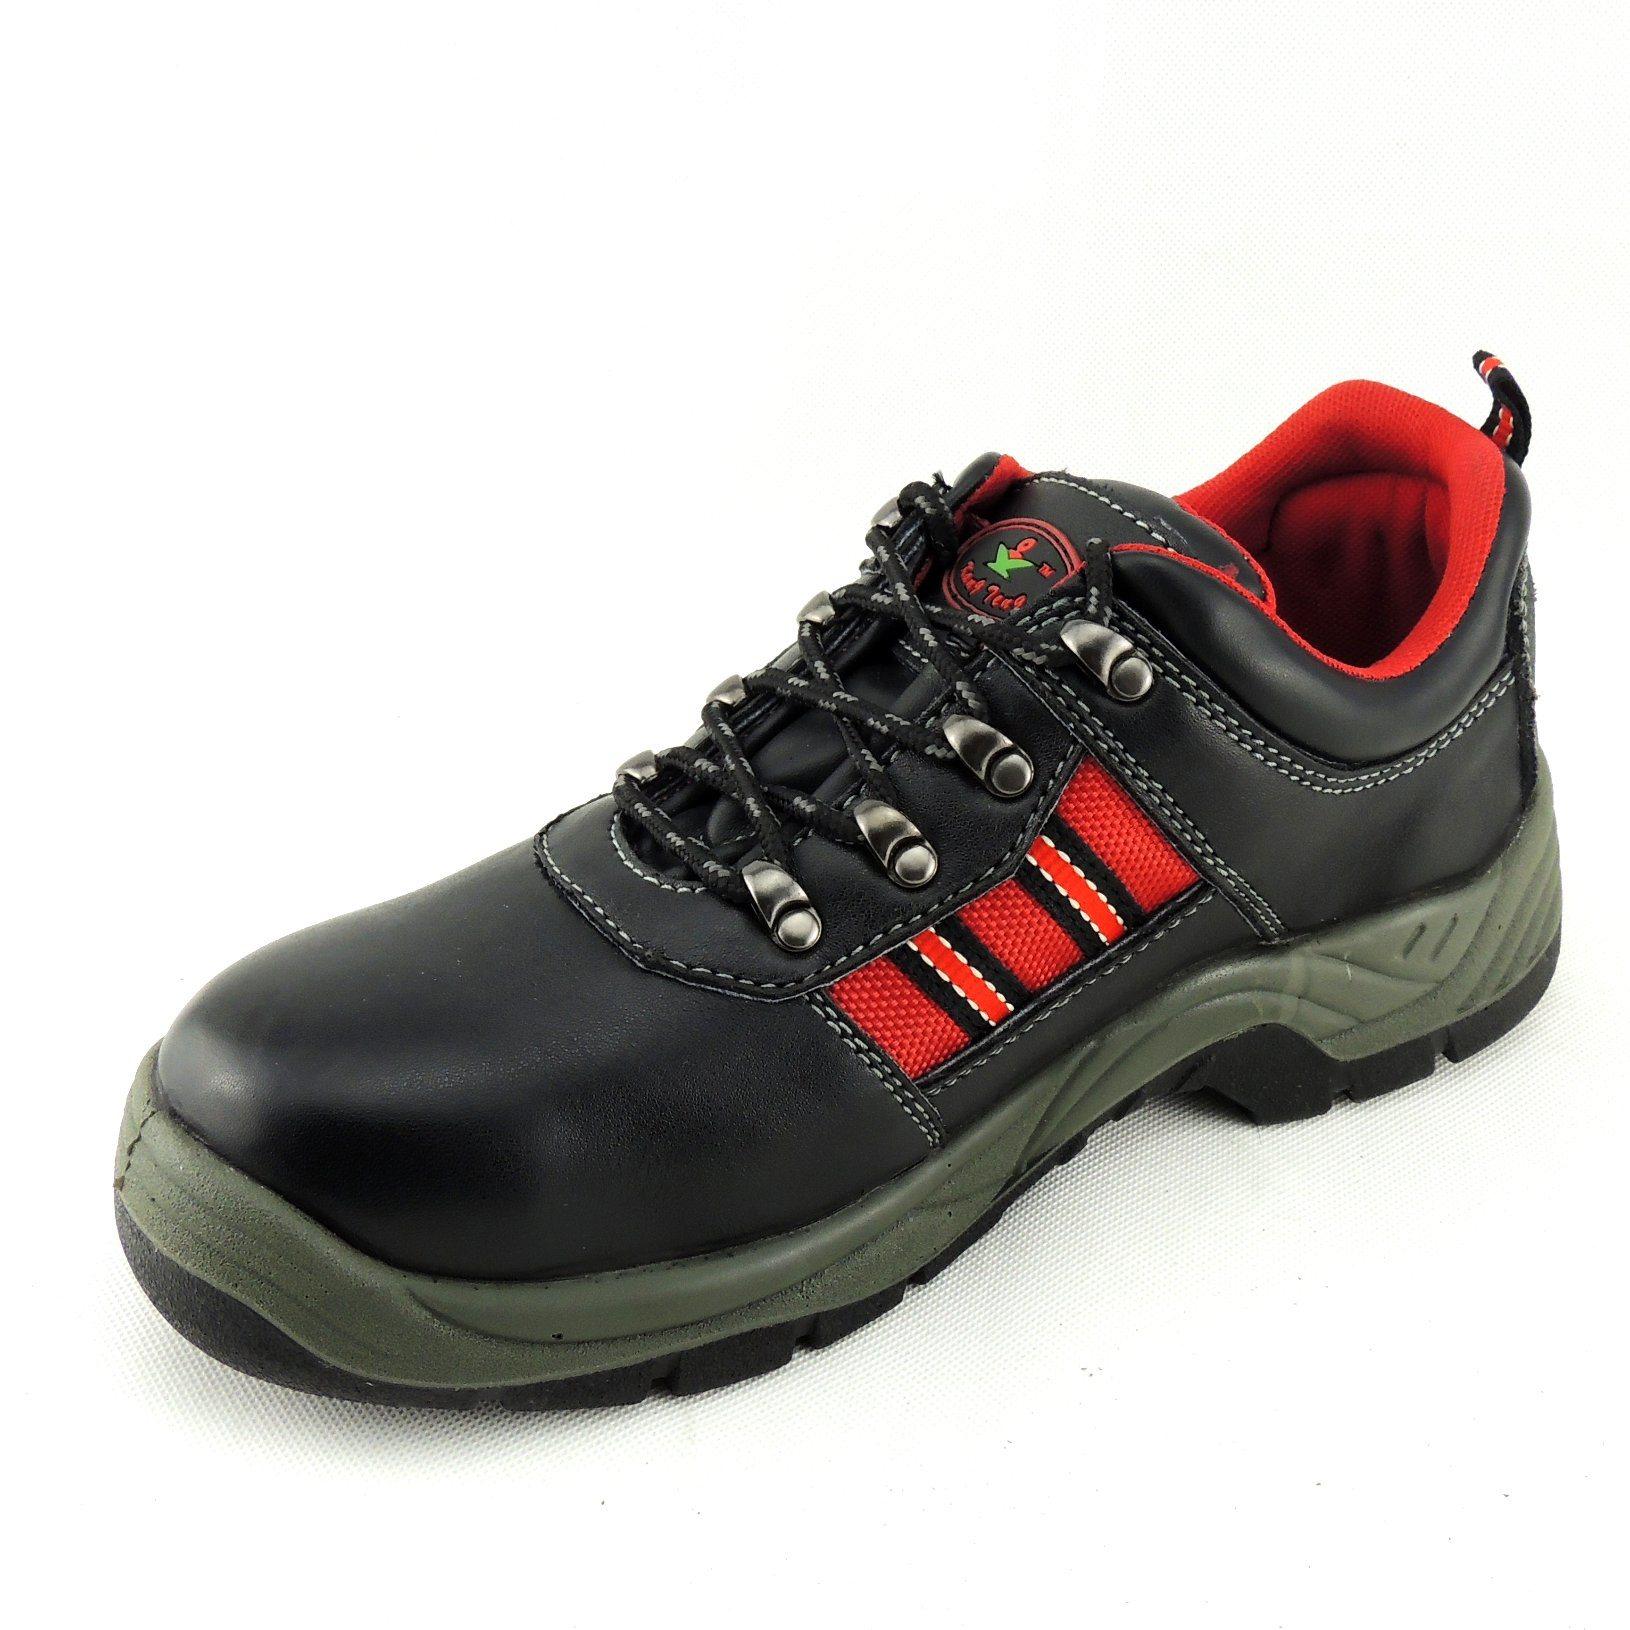 Economic Split Leather PU Sole Anti-Hit Safety Work Footwear